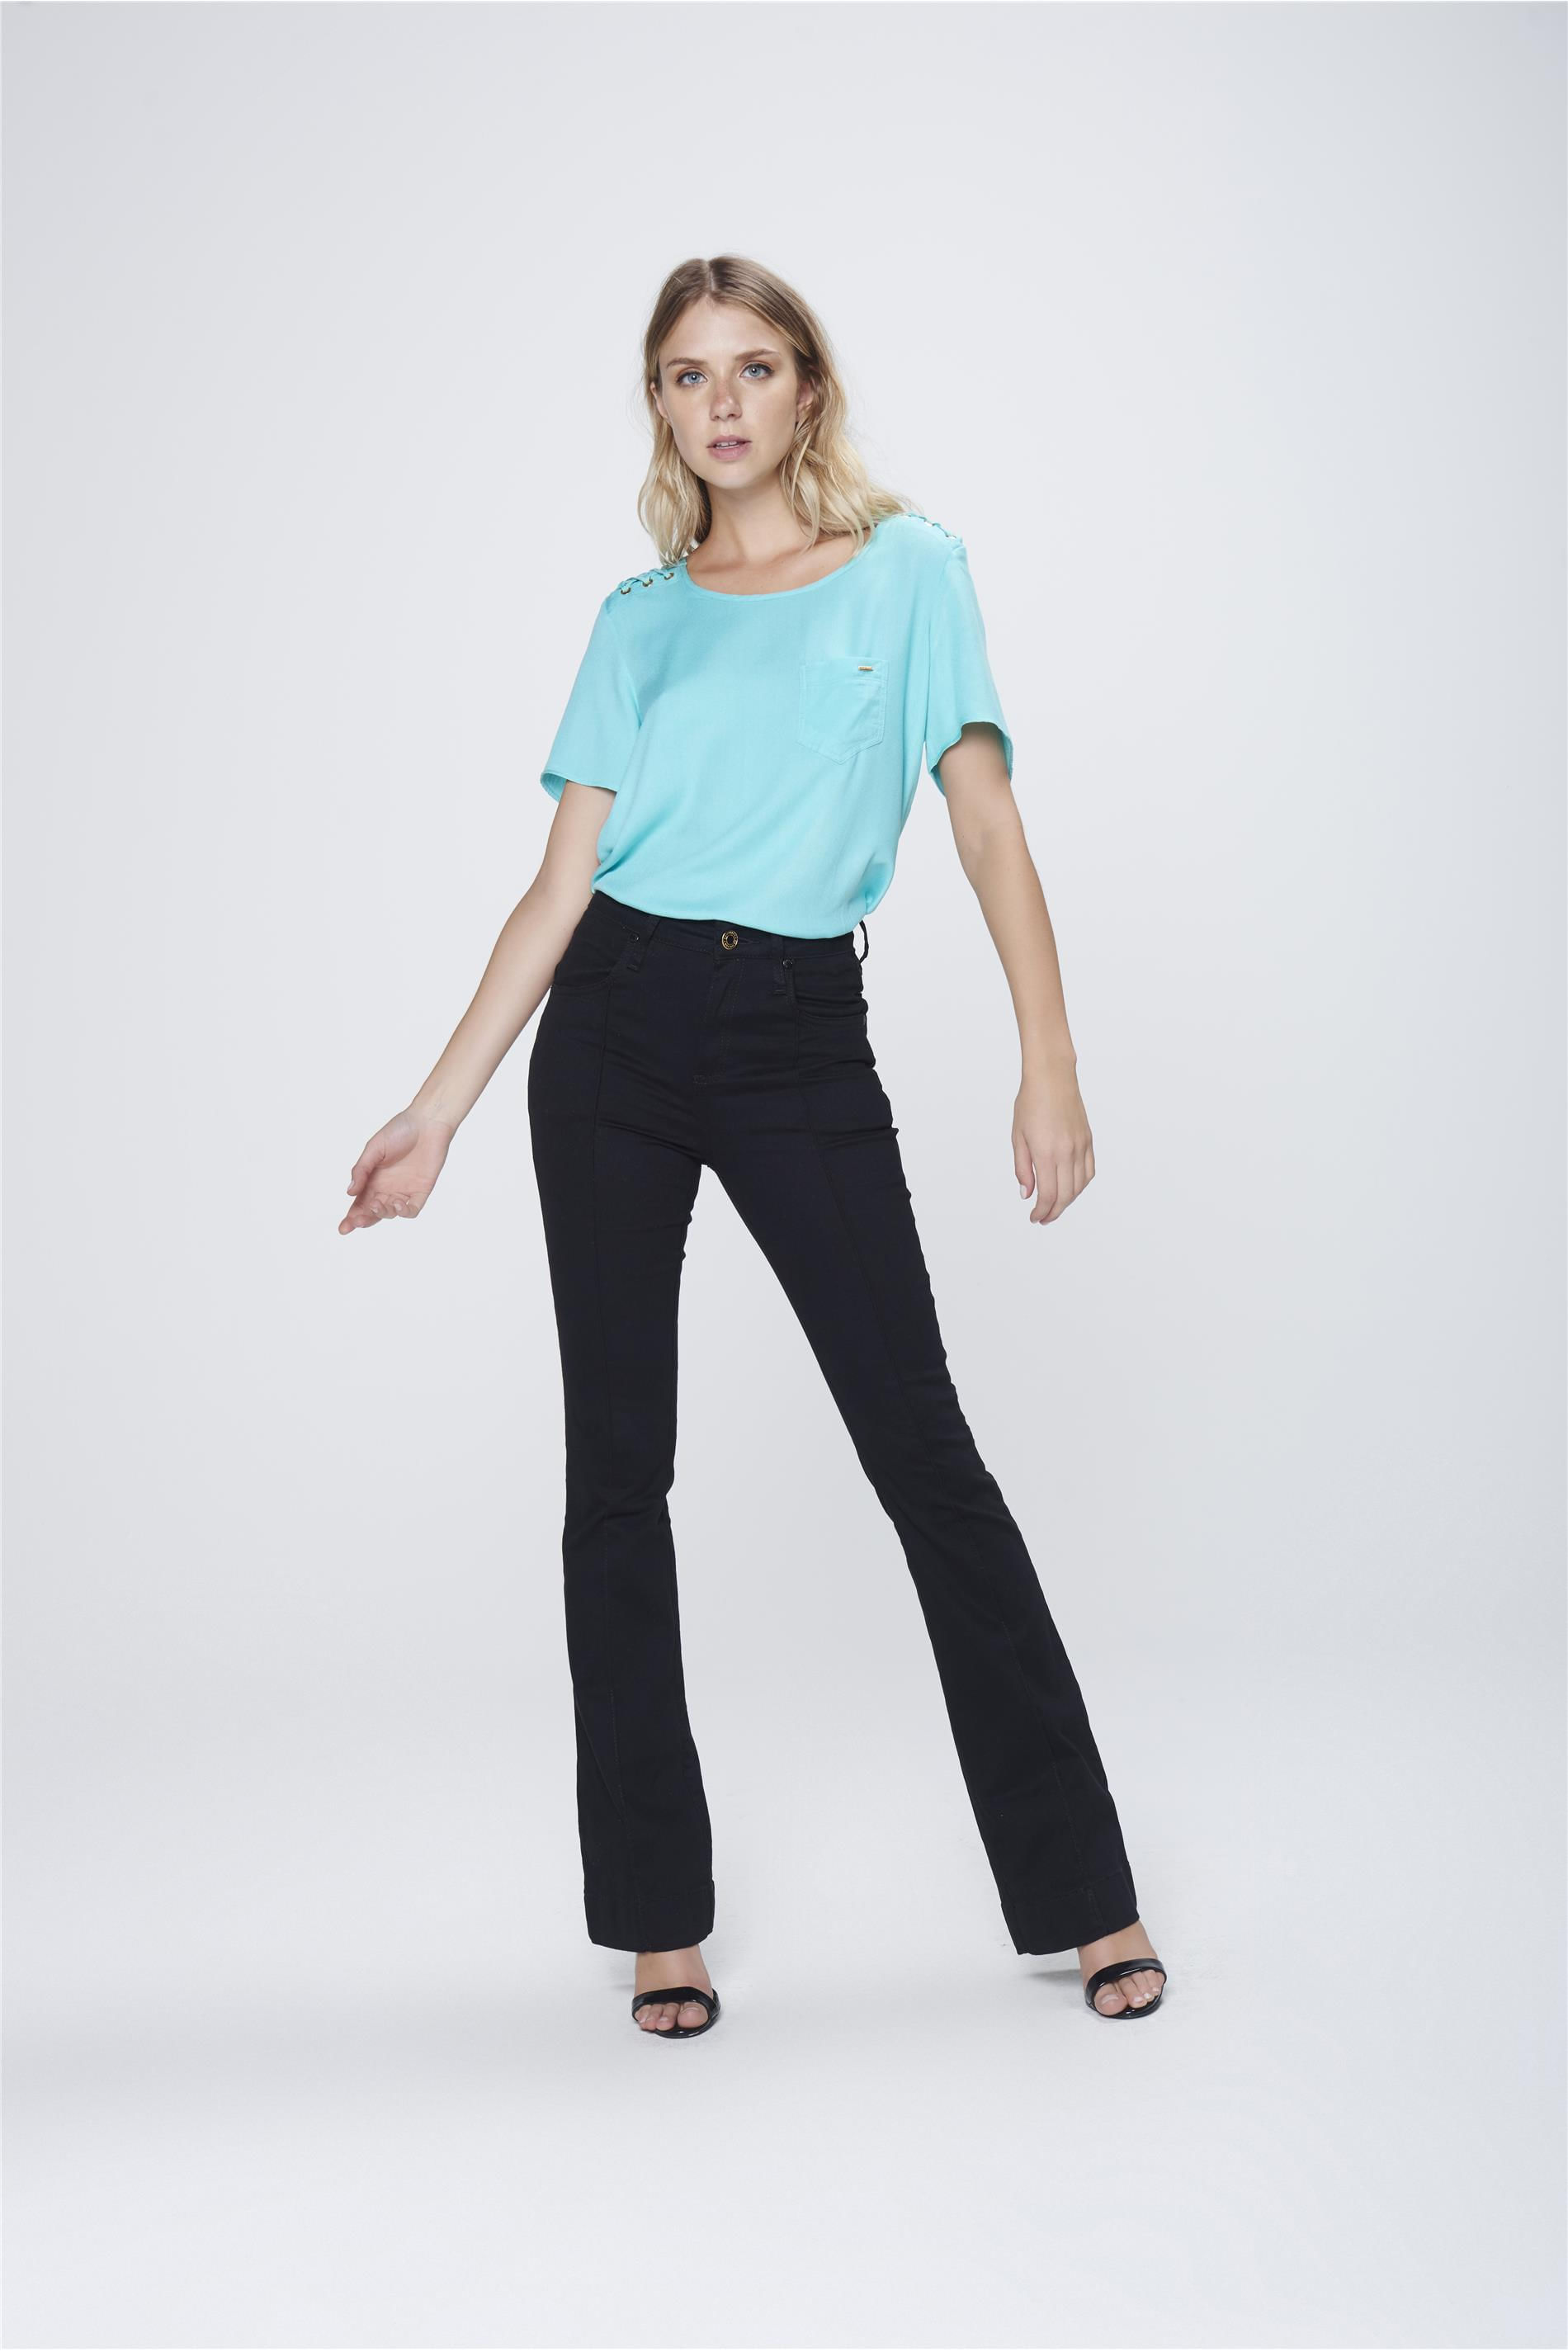 23615a37f Calça Boot Cut Jeans Preta Cintura Alta - Damyller